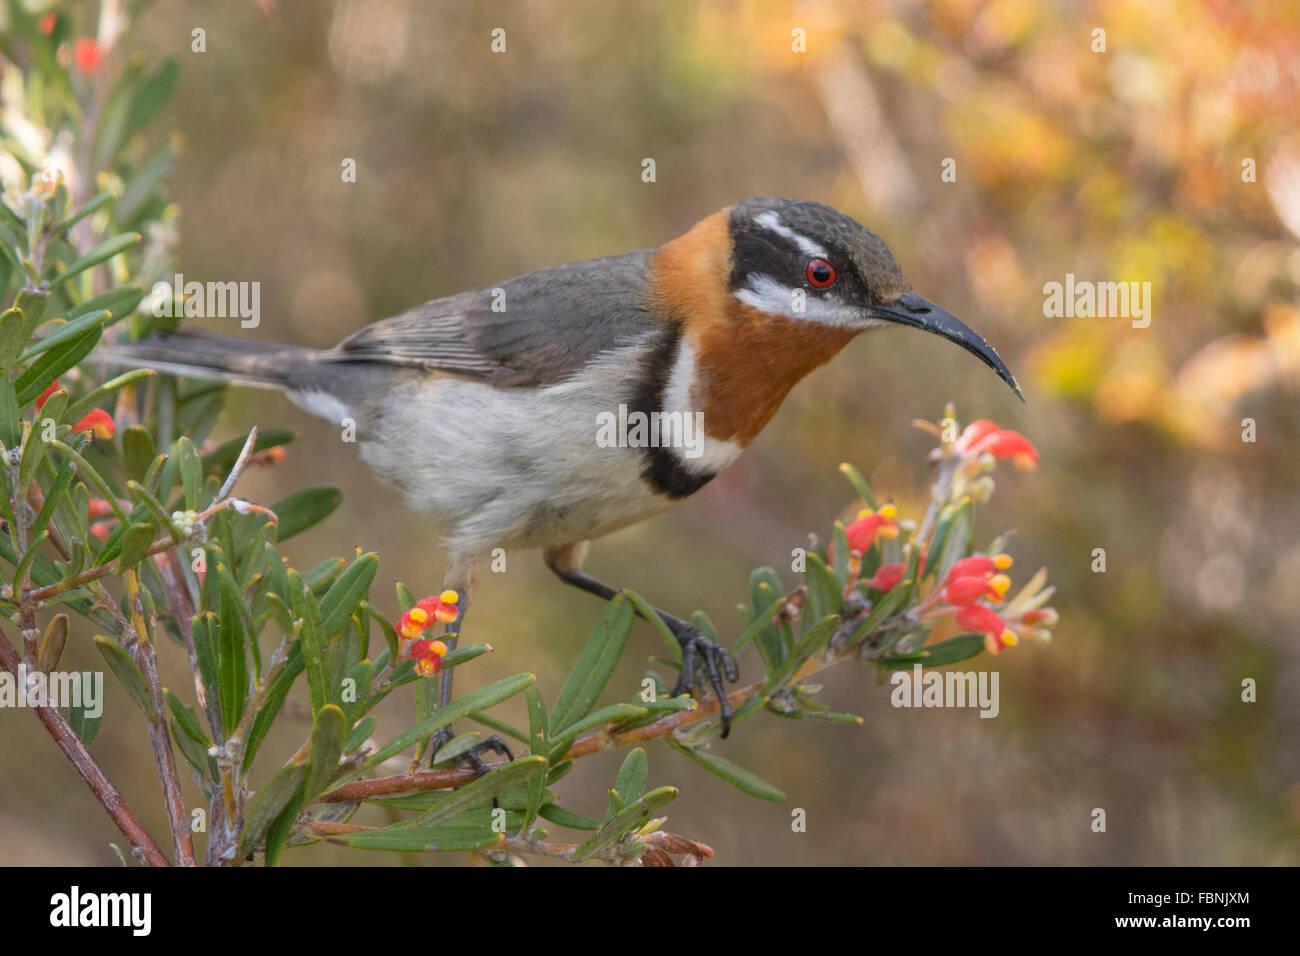 Western Spinebill (Acanthorhynchus superciliosus) - Stock Image